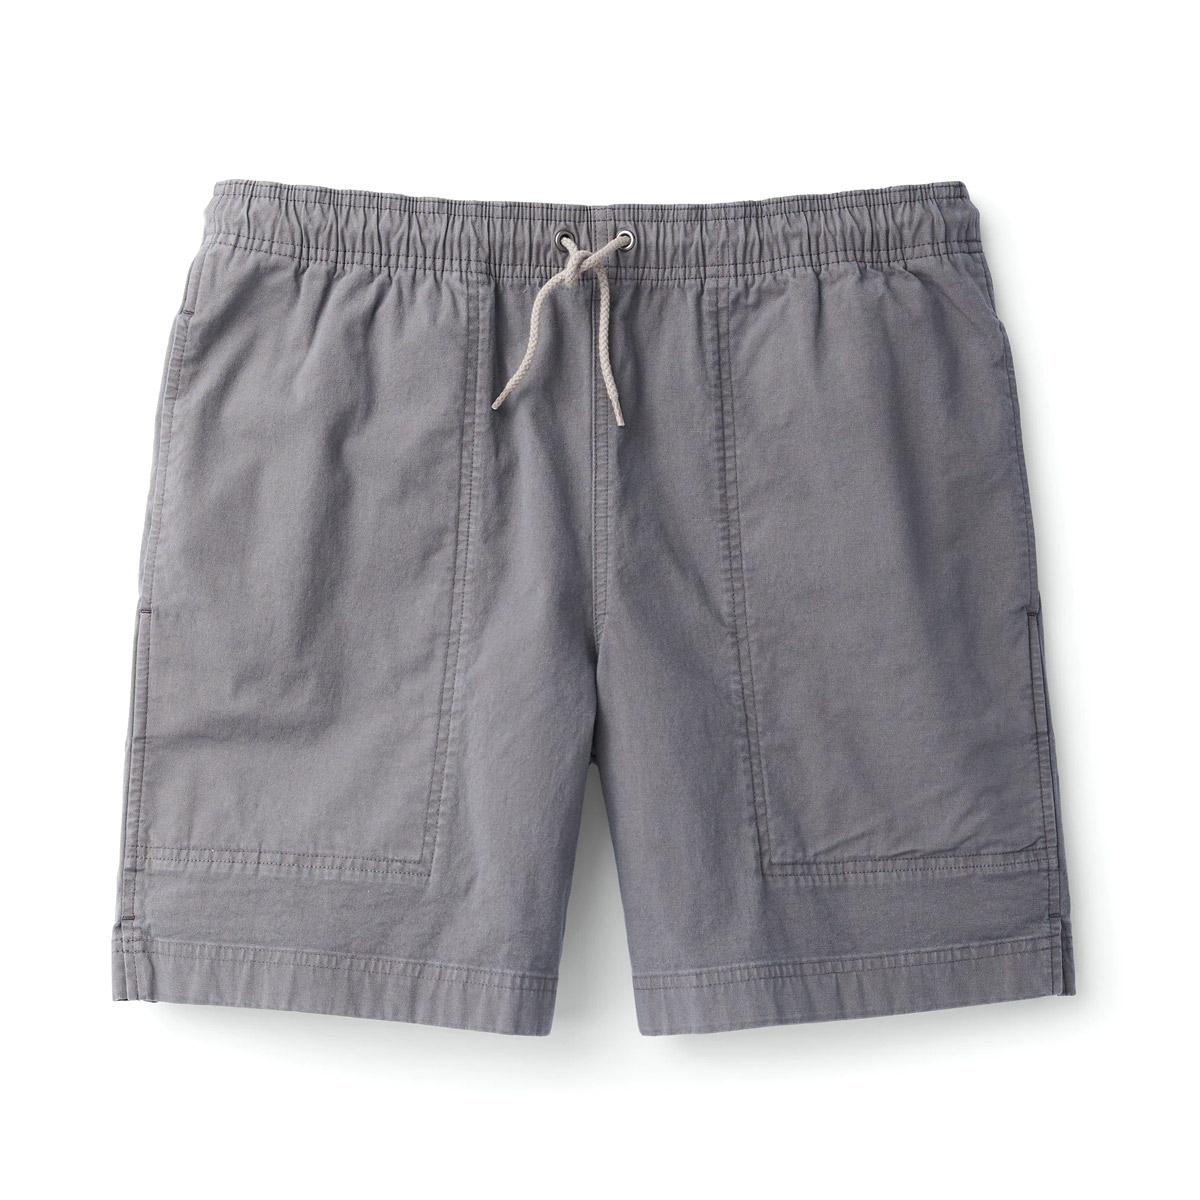 Filson Dry Falls Shorts Charcoal Gray